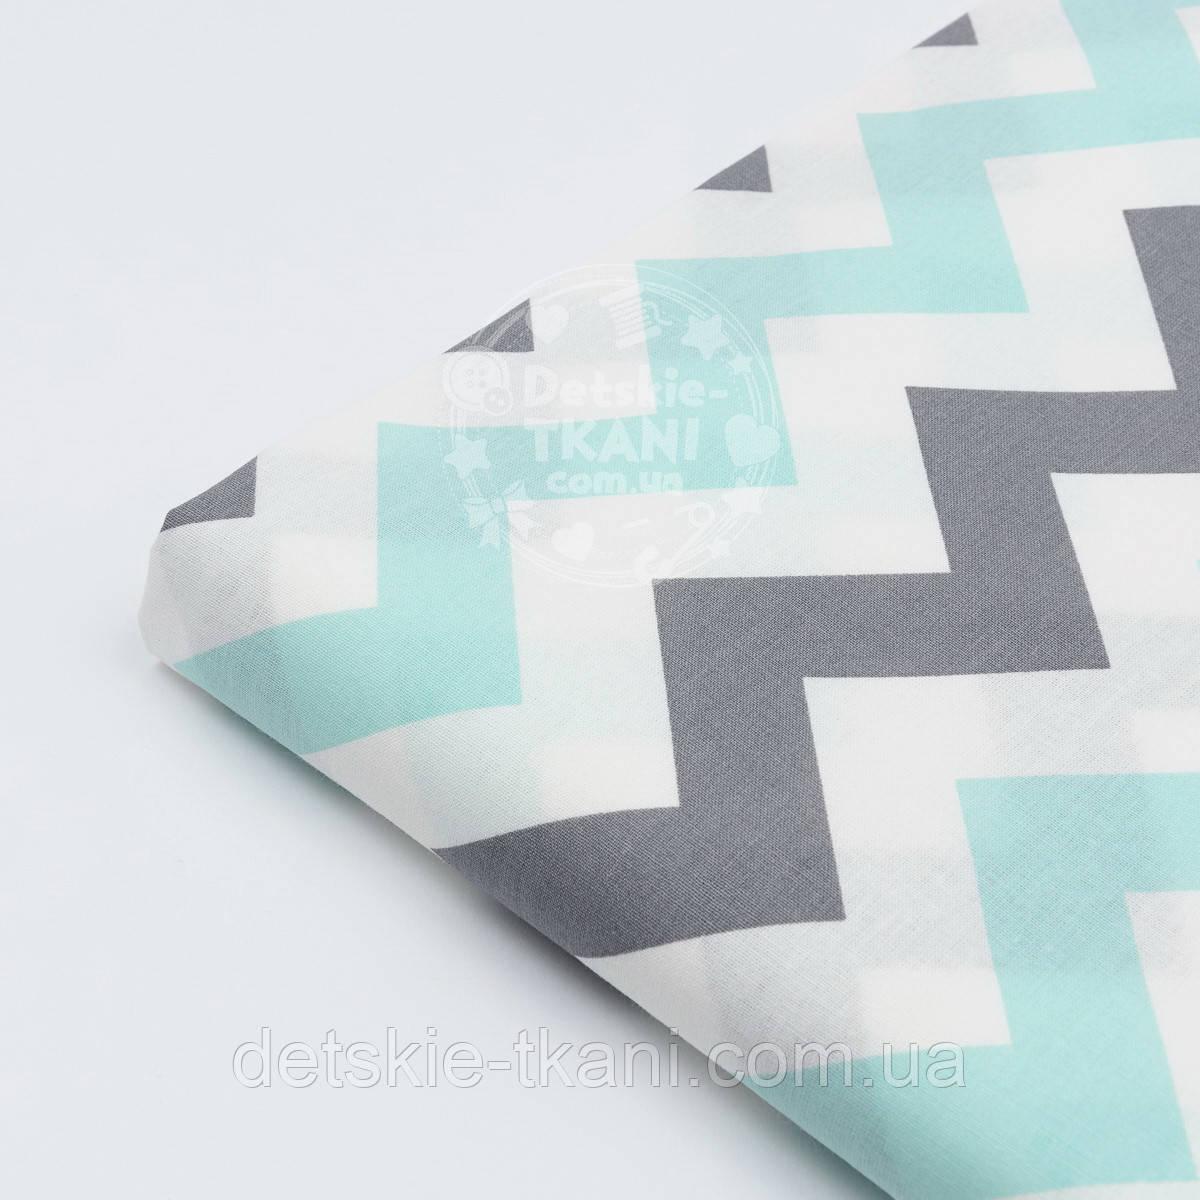 Лоскут ткани ранфорс с мятными и серыми зигзагами, ширина 240 см (№1156)